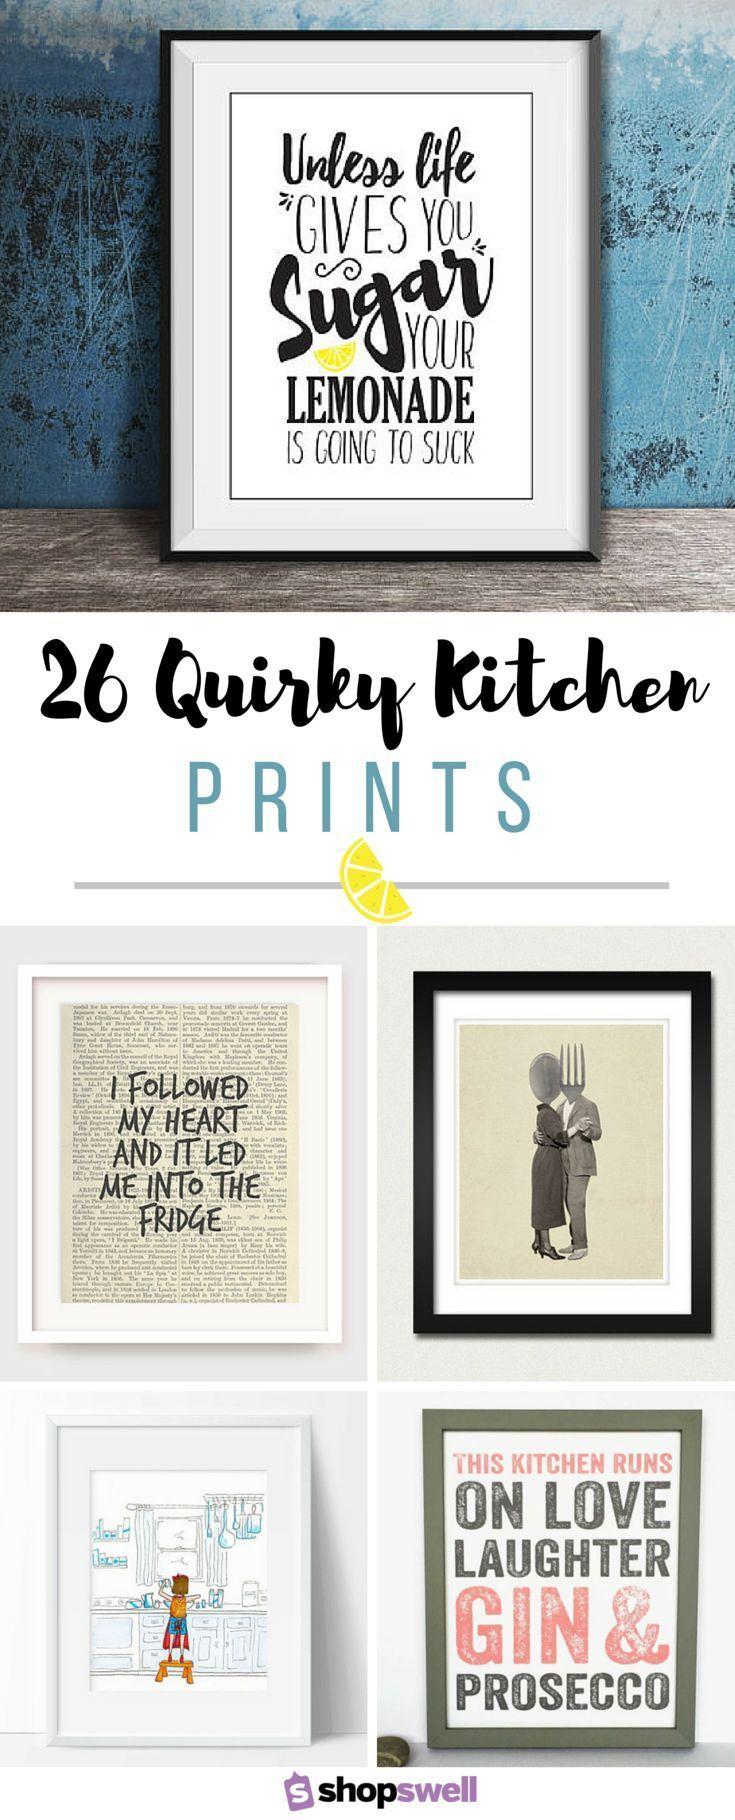 8x10 küchenideen  best kitchen decor images on pinterest  frames kitchens and my house